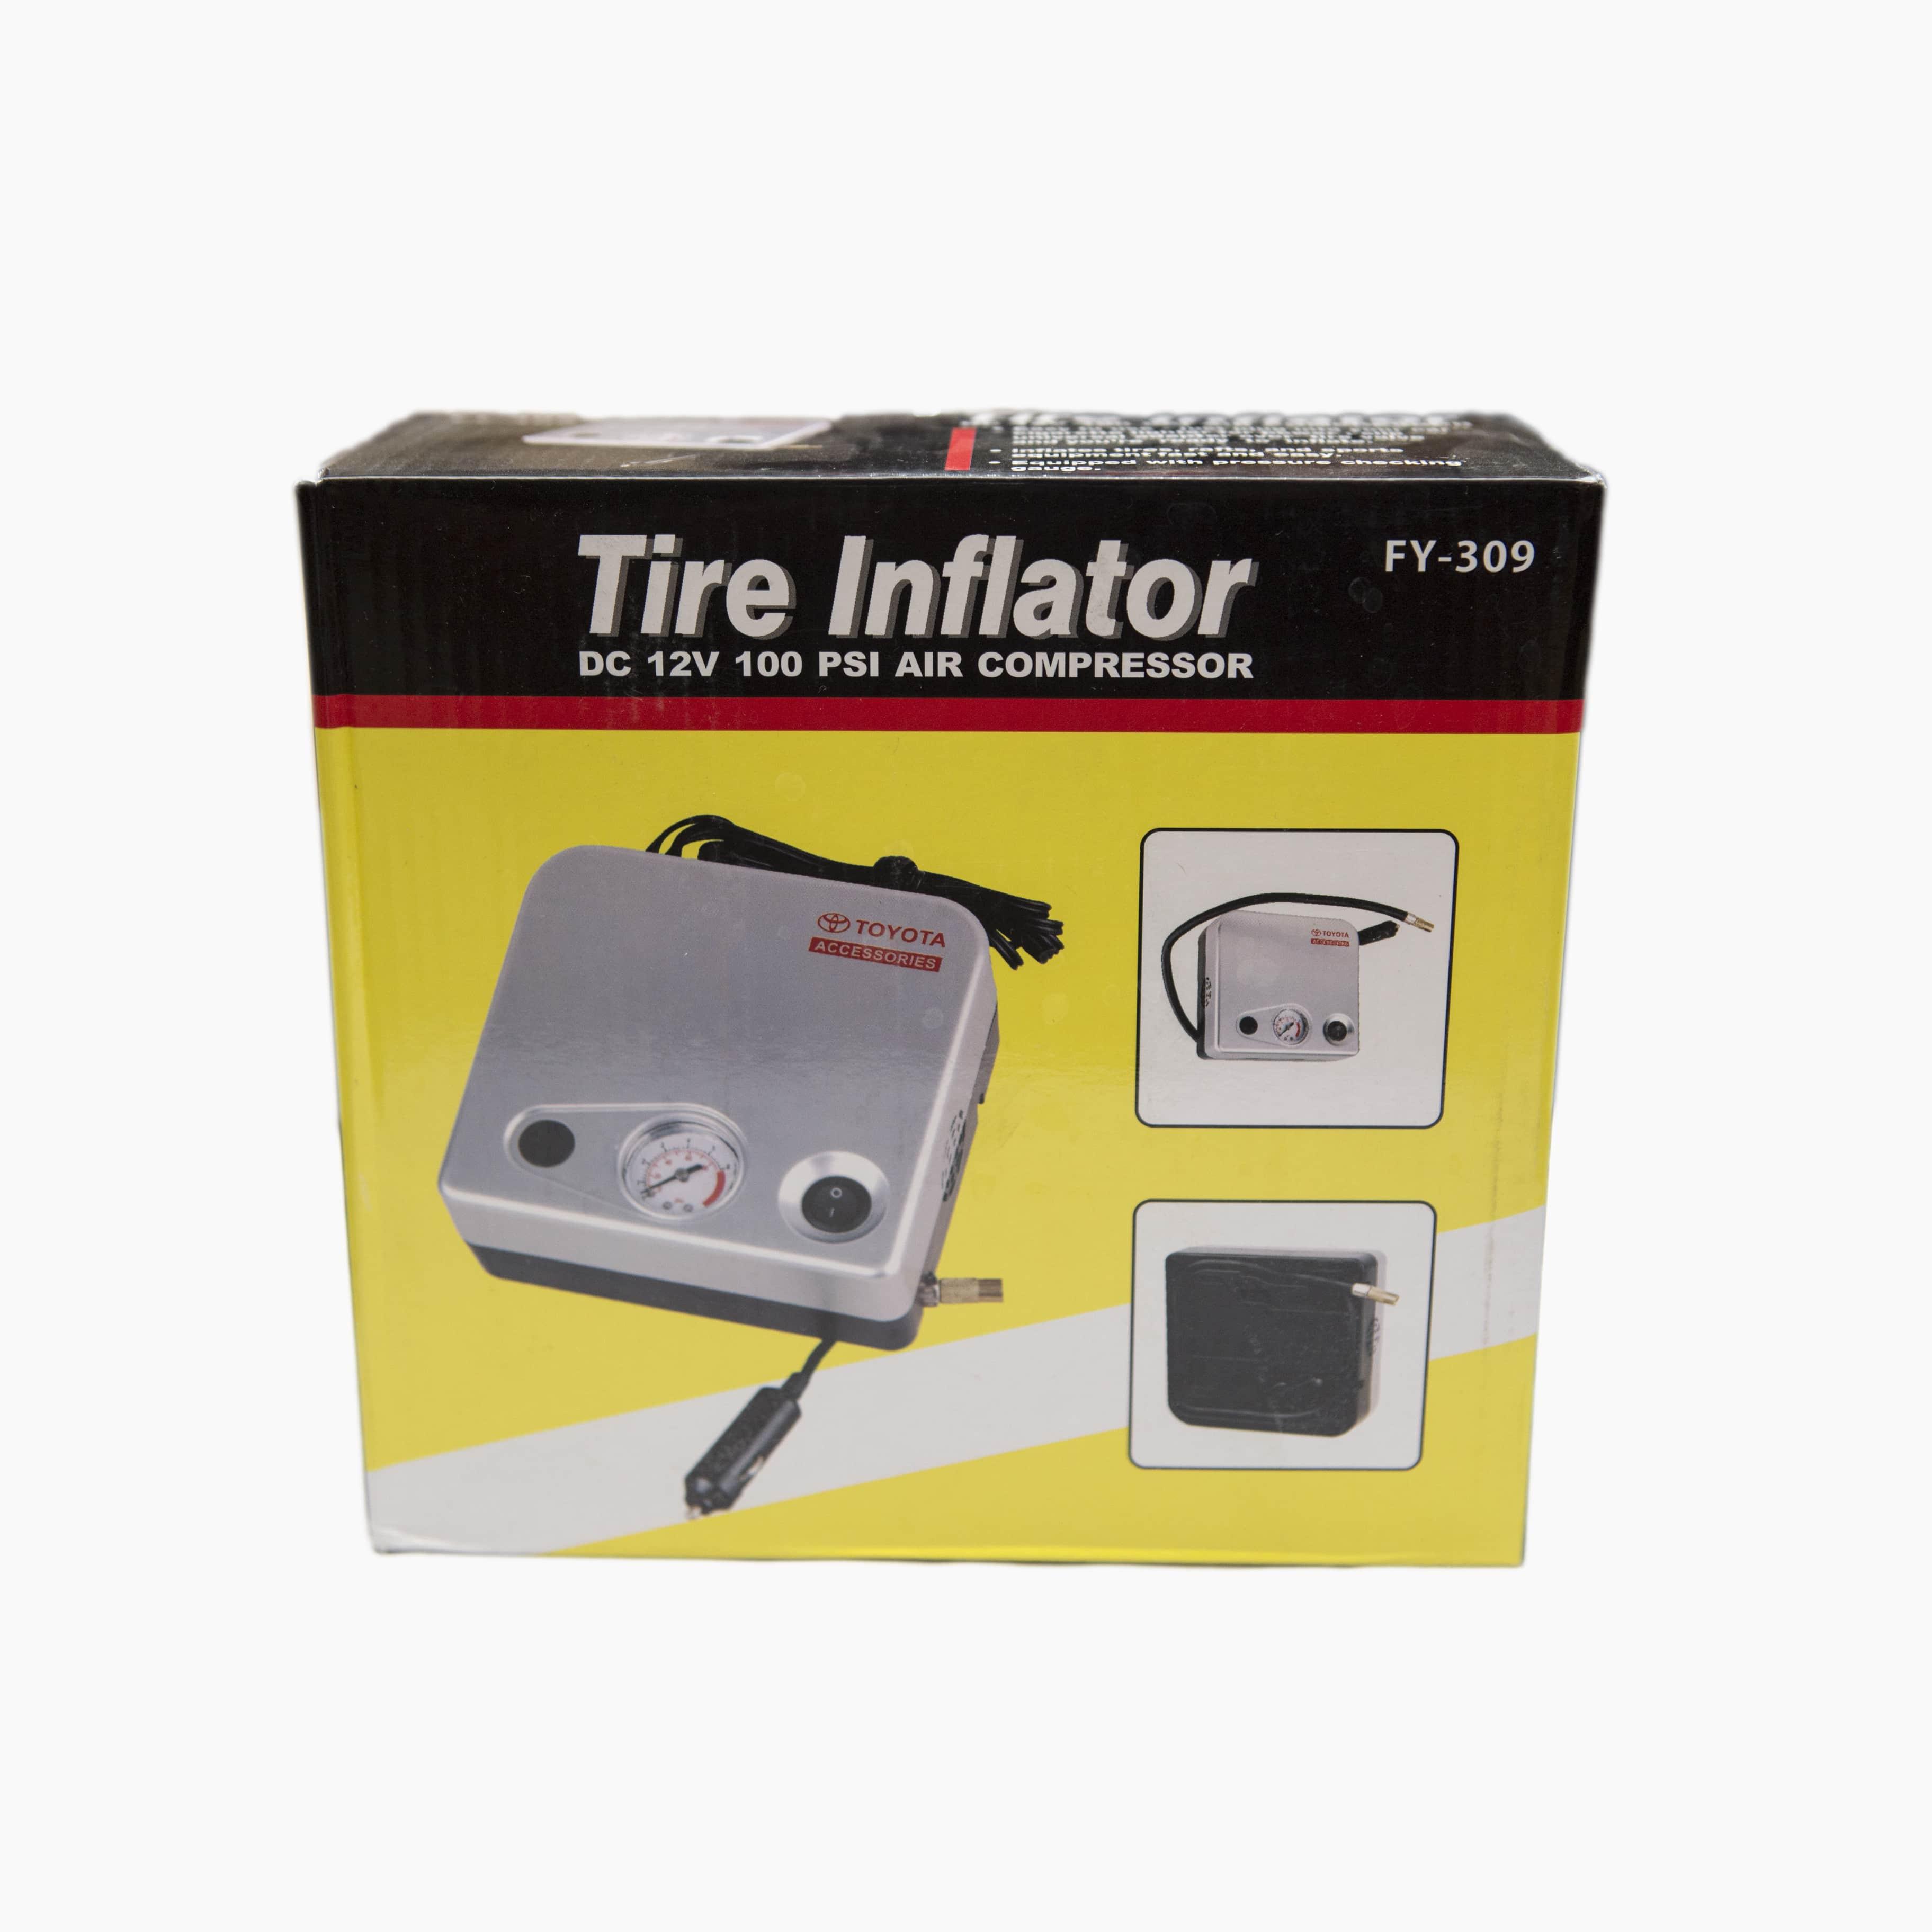 Tyre Inflator - Normal